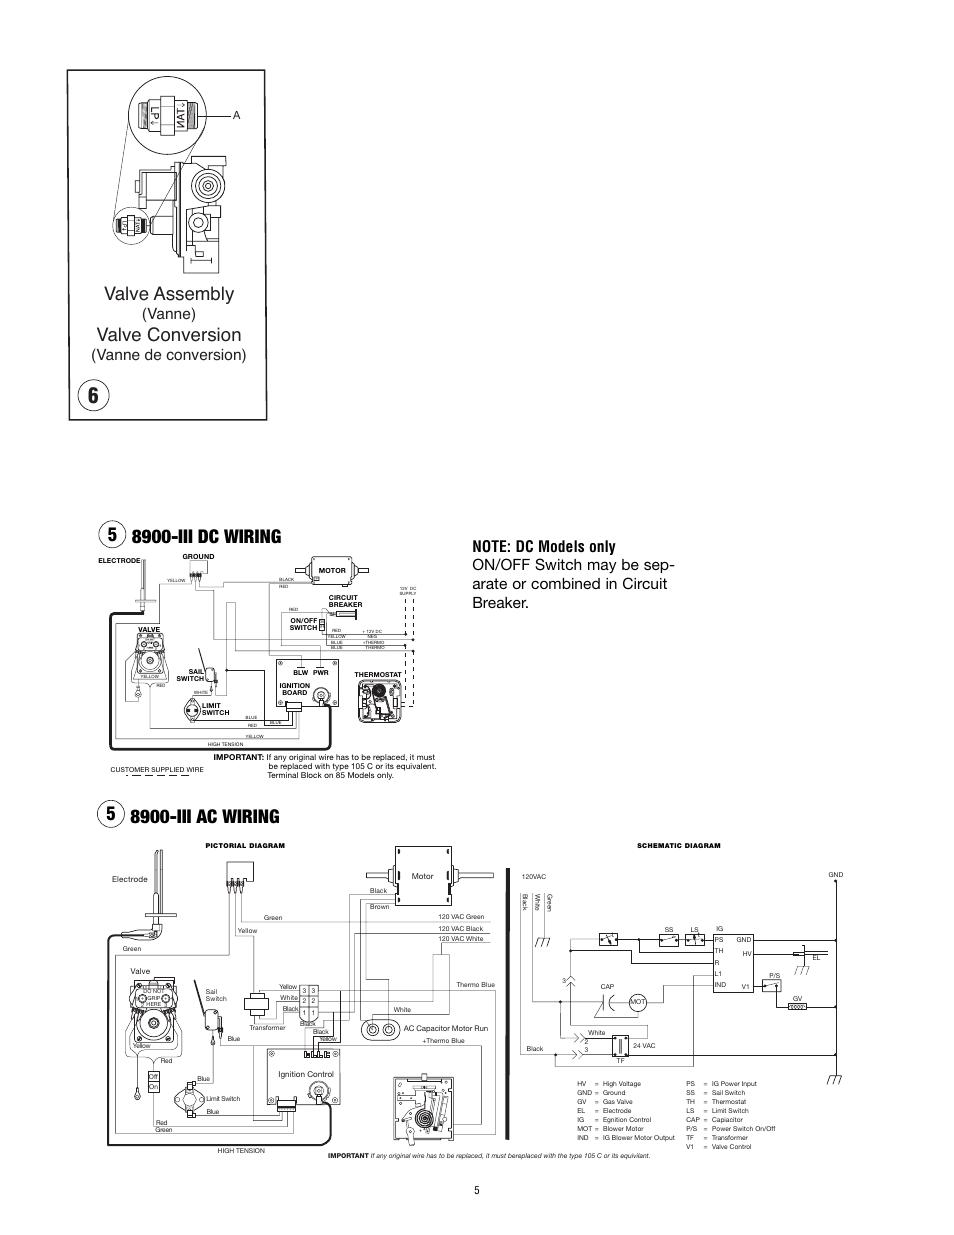 hight resolution of valve assembly valve conversion vanne vanne de conversion atwood mobile